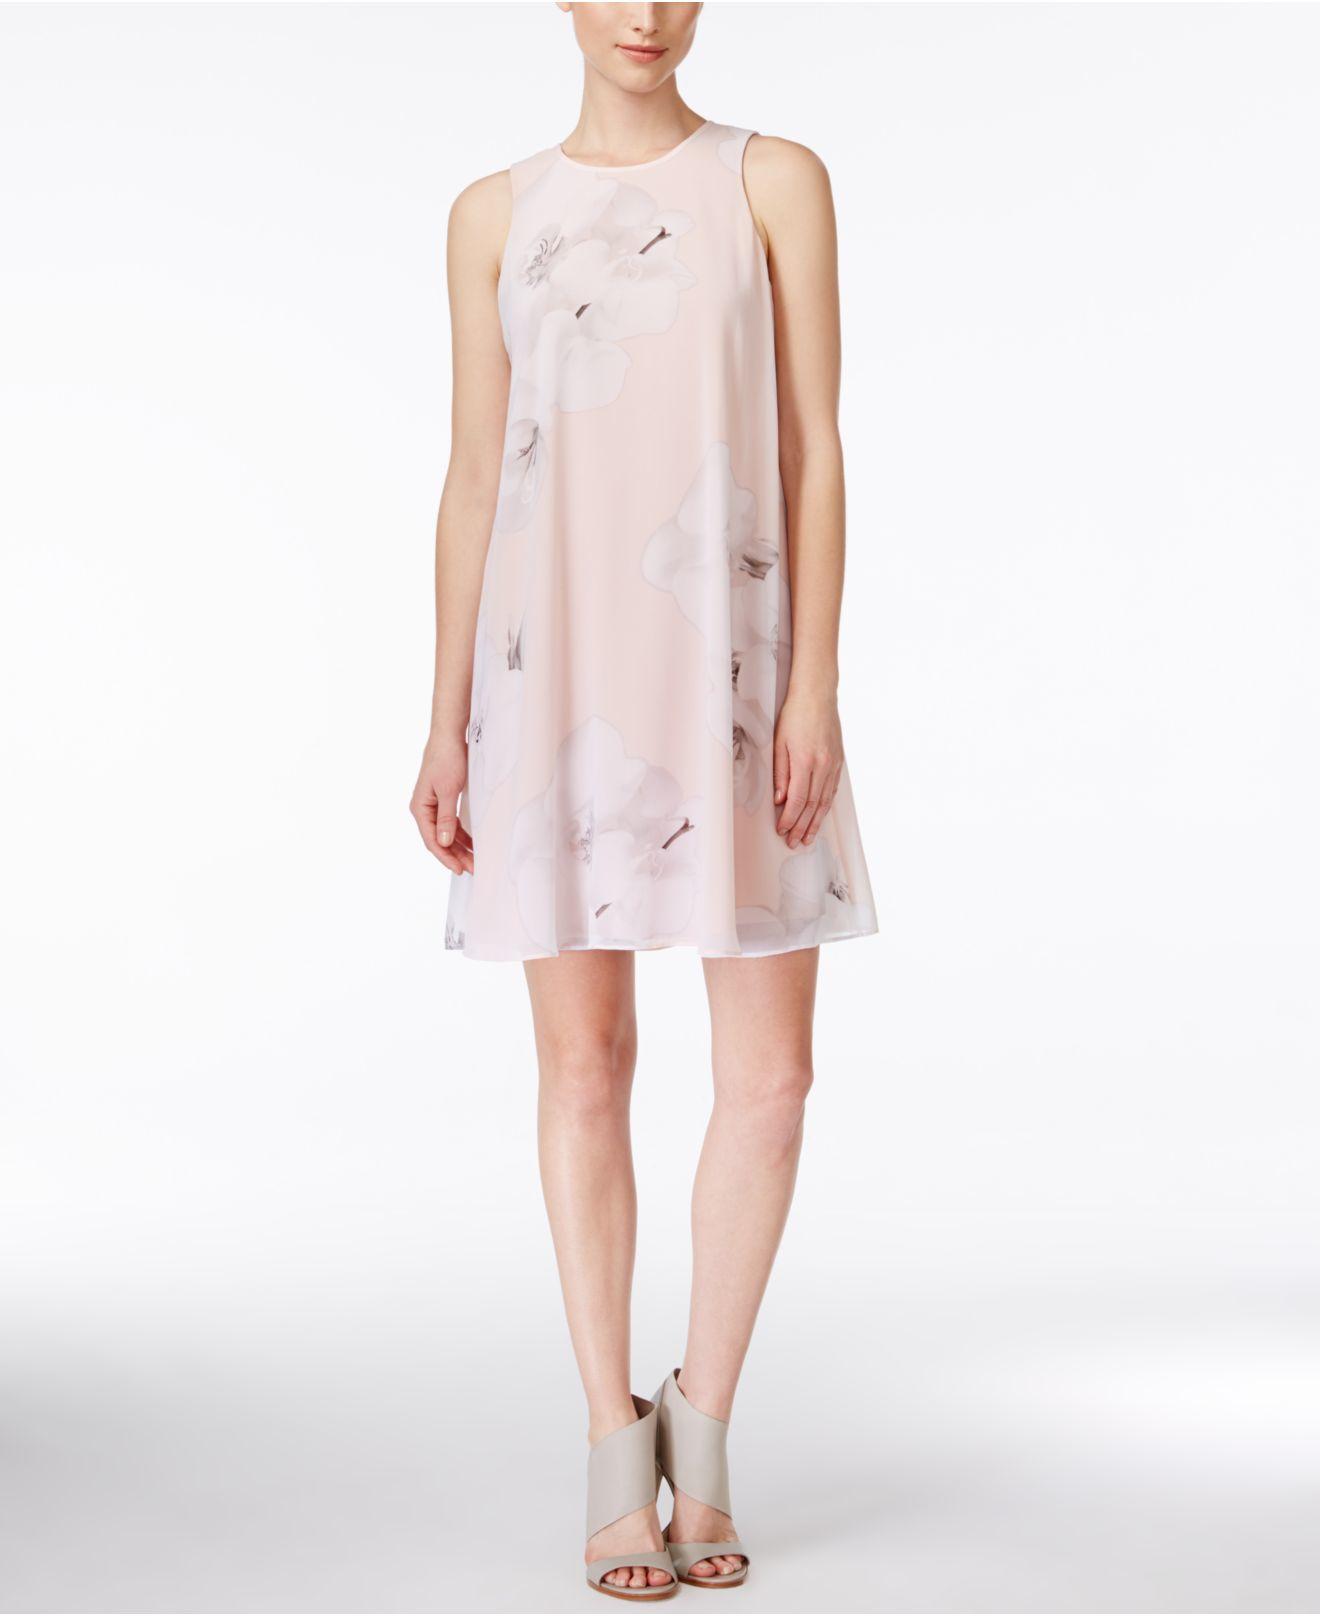 Calvin Klein Sleeveless Floral Print Sheath Dress In